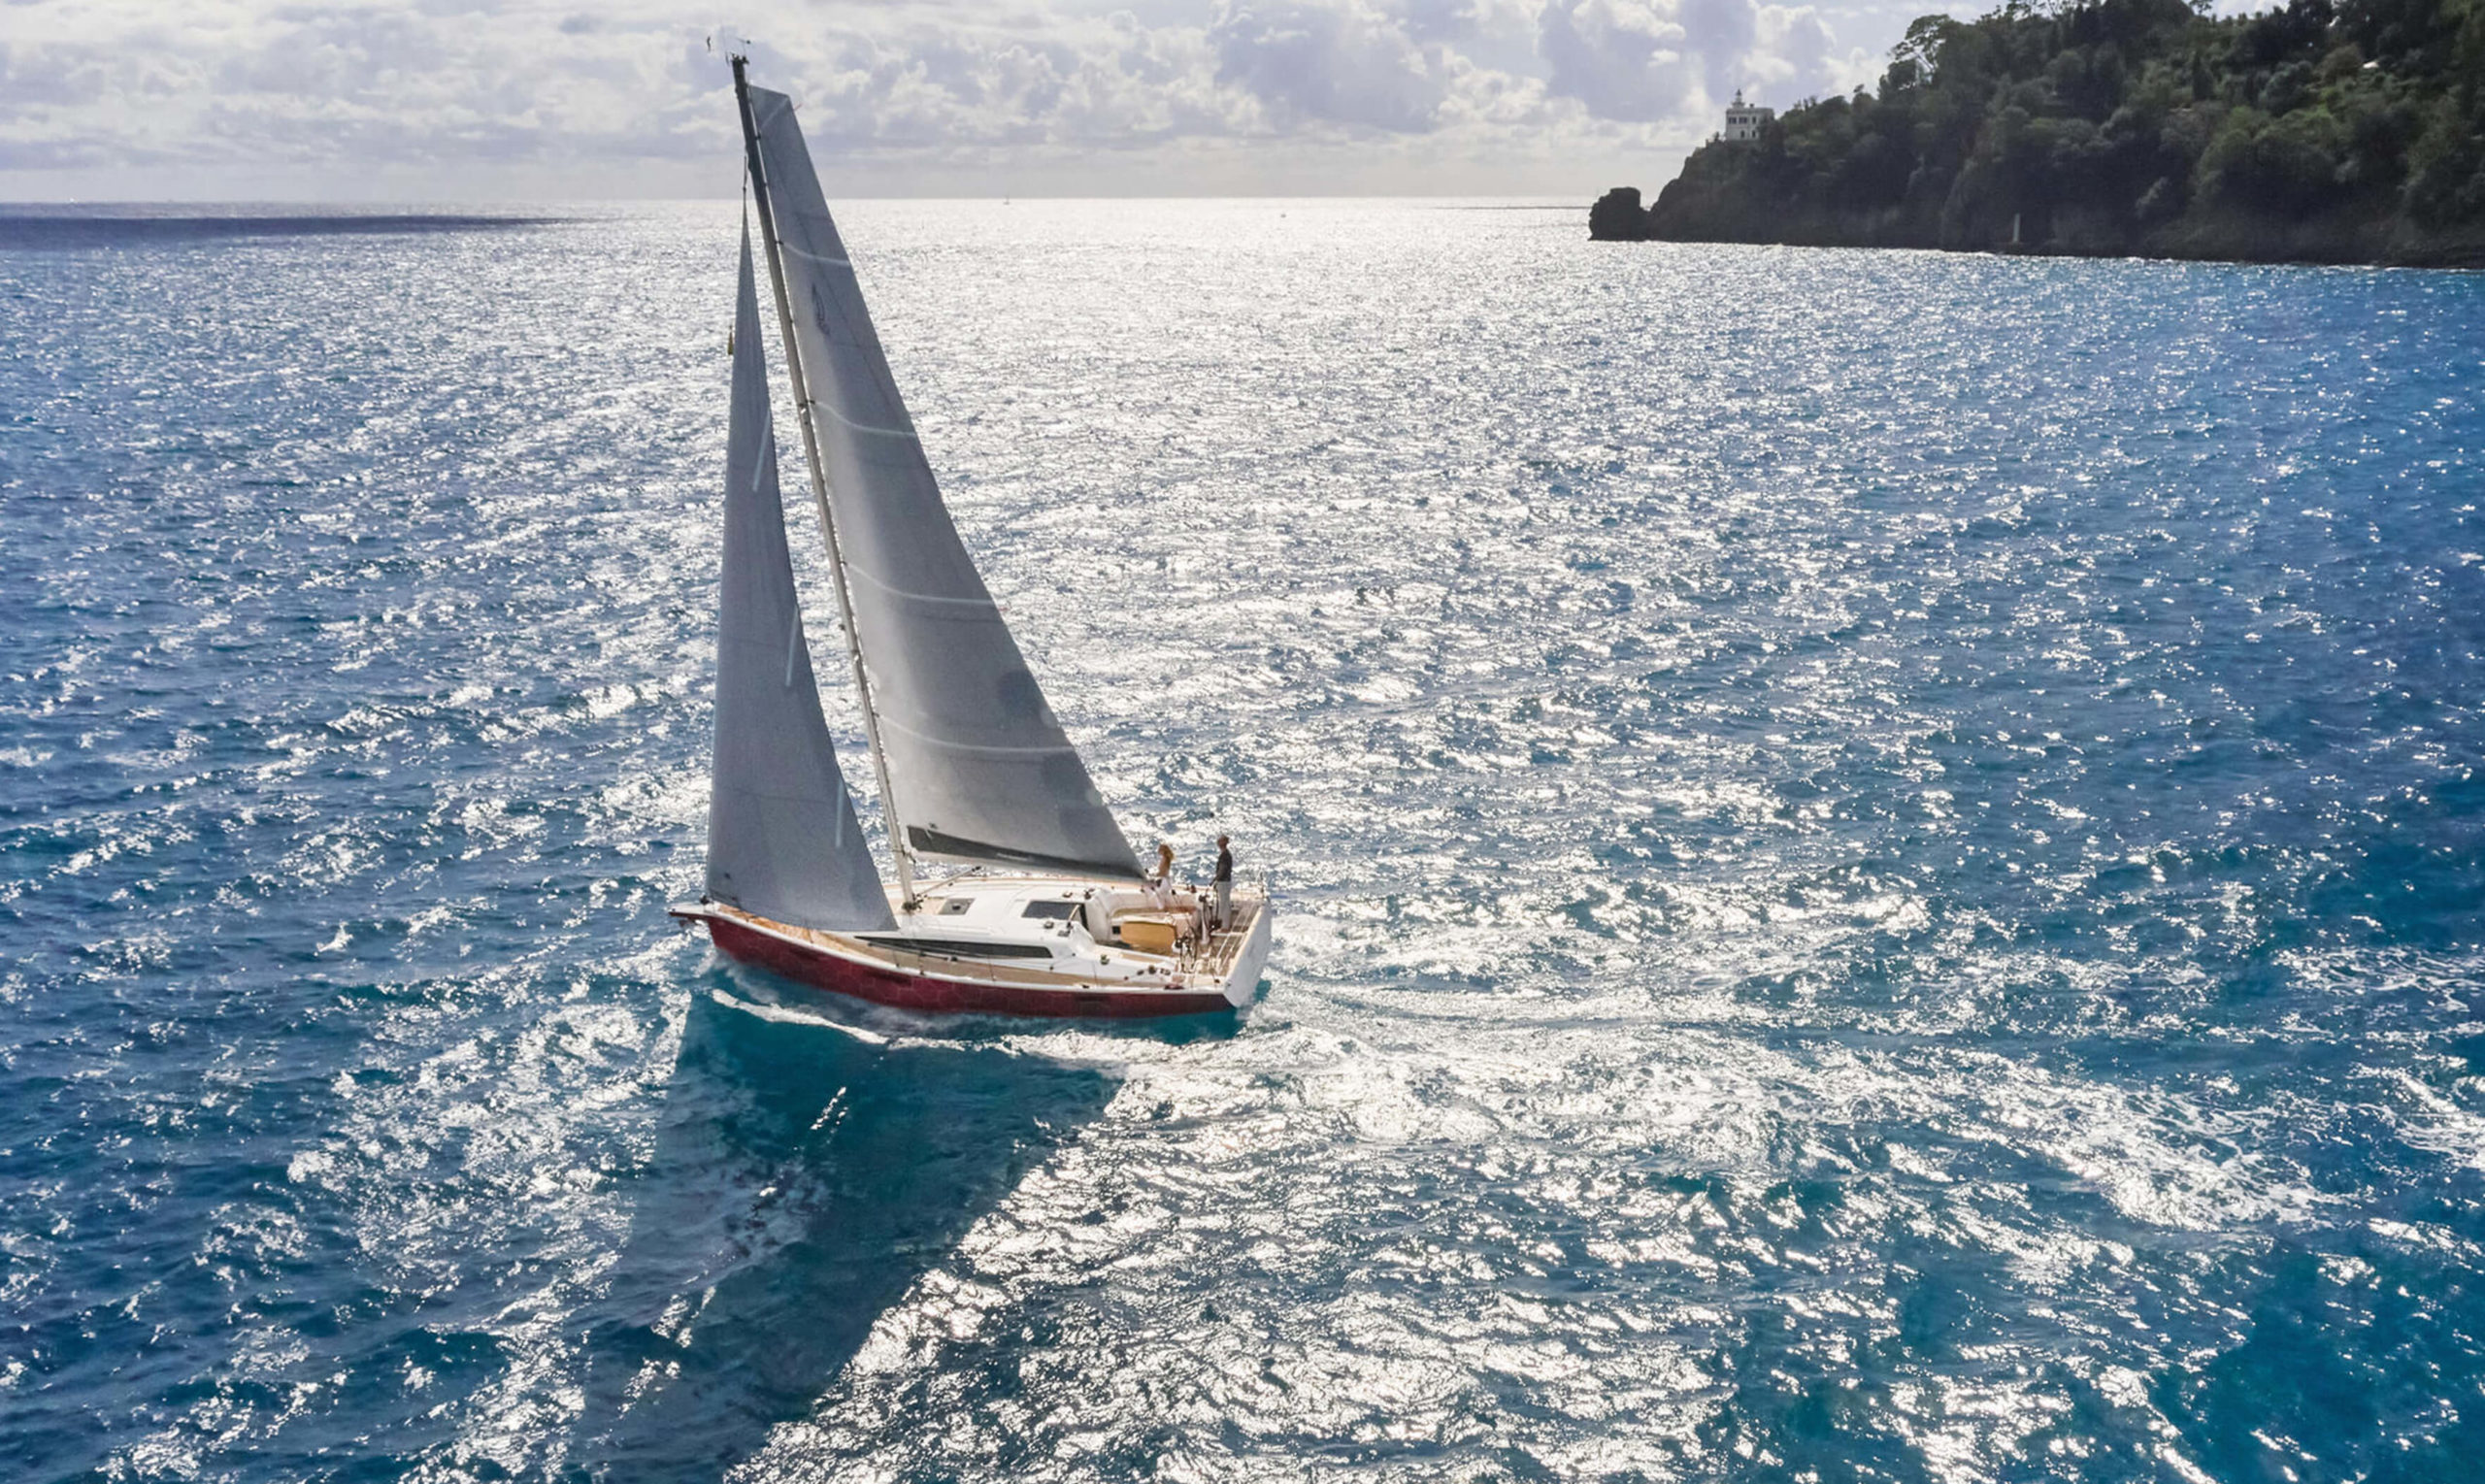 Dehler_38_SQ_Navicap_USHIP_cap_d_agde_voilier_bateau_accastillage_neuf_chantier_naval_DEHLER_HANSE_BRIG-3